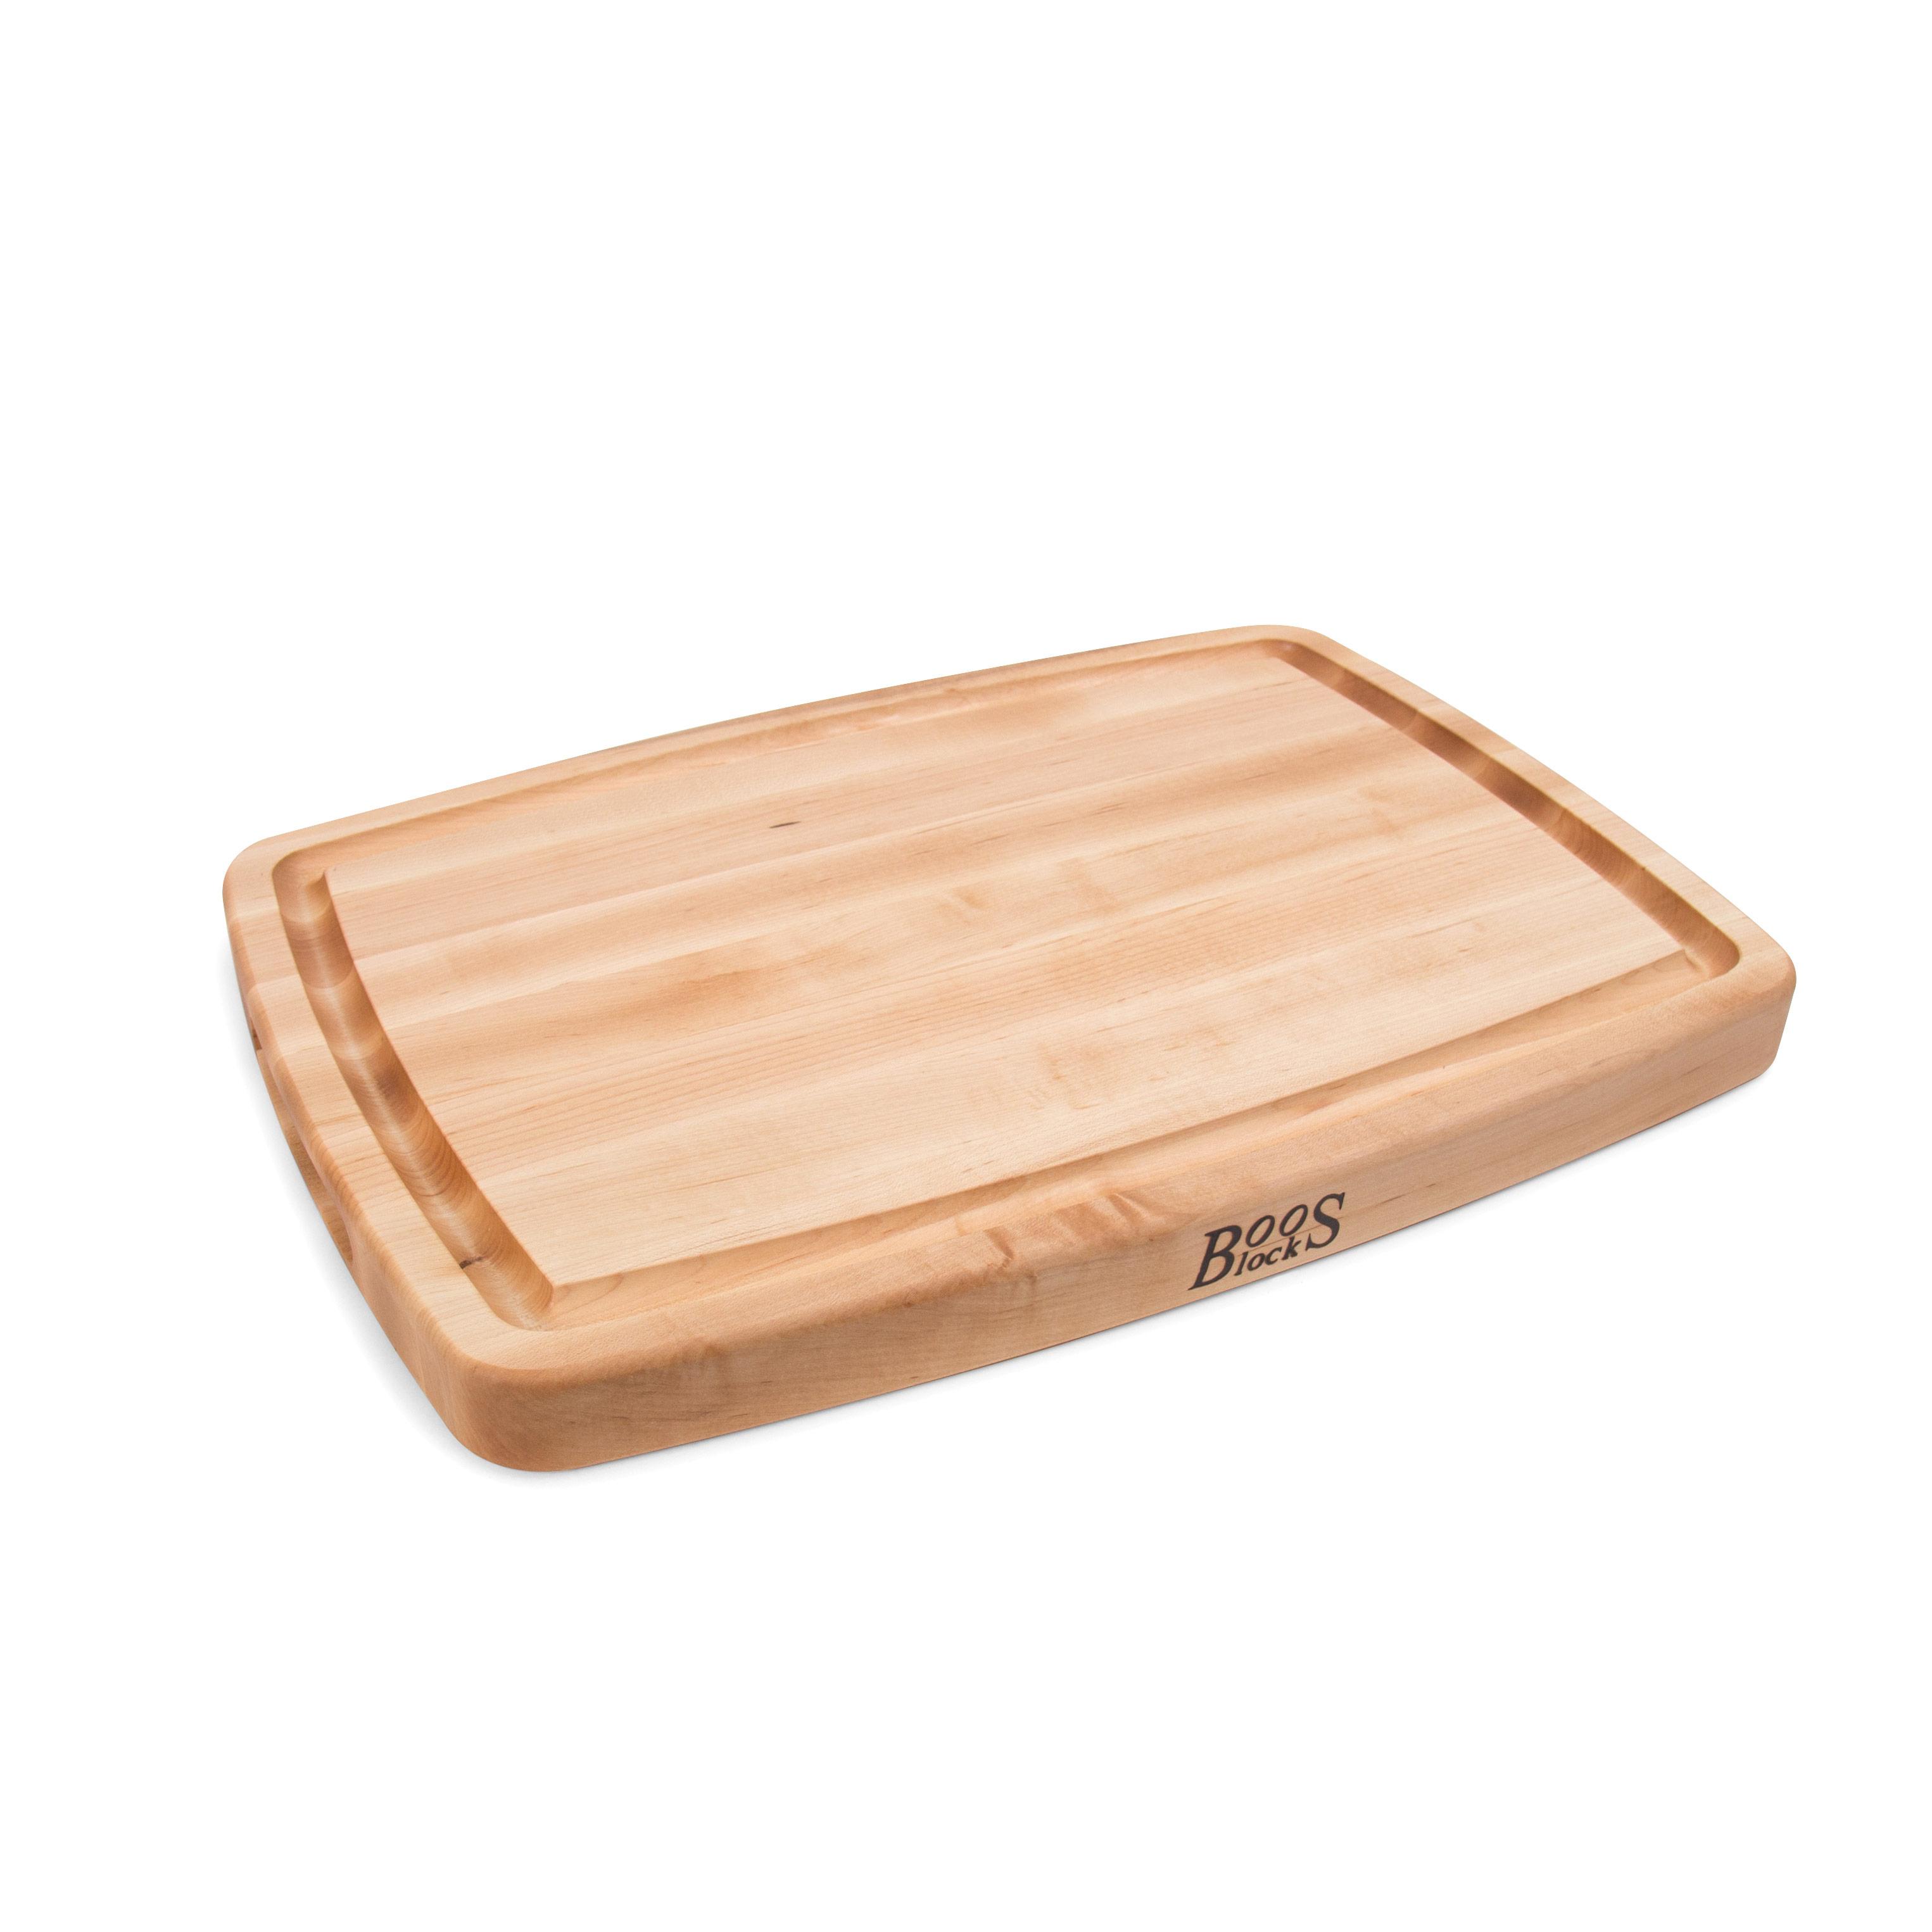 John Boos CB1050-1M2014150 cutting board, wood